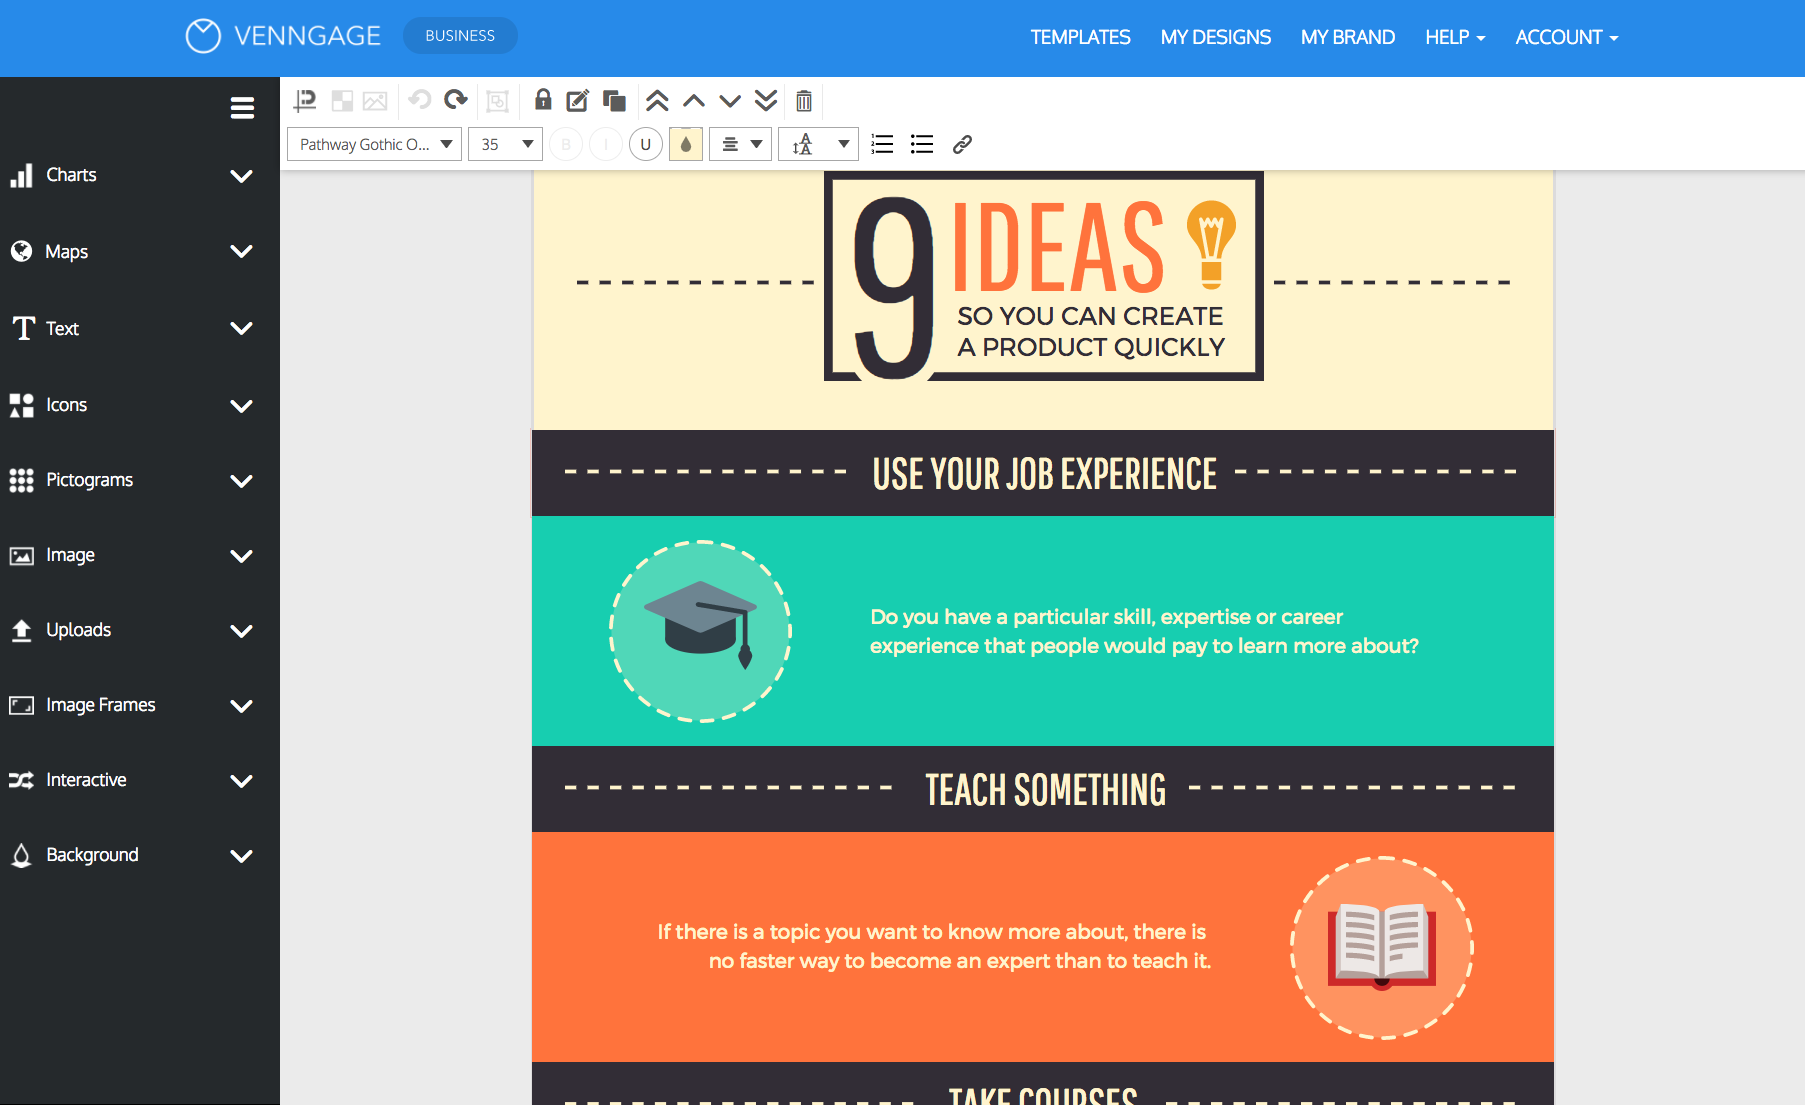 Design Process Infographic - Venngage